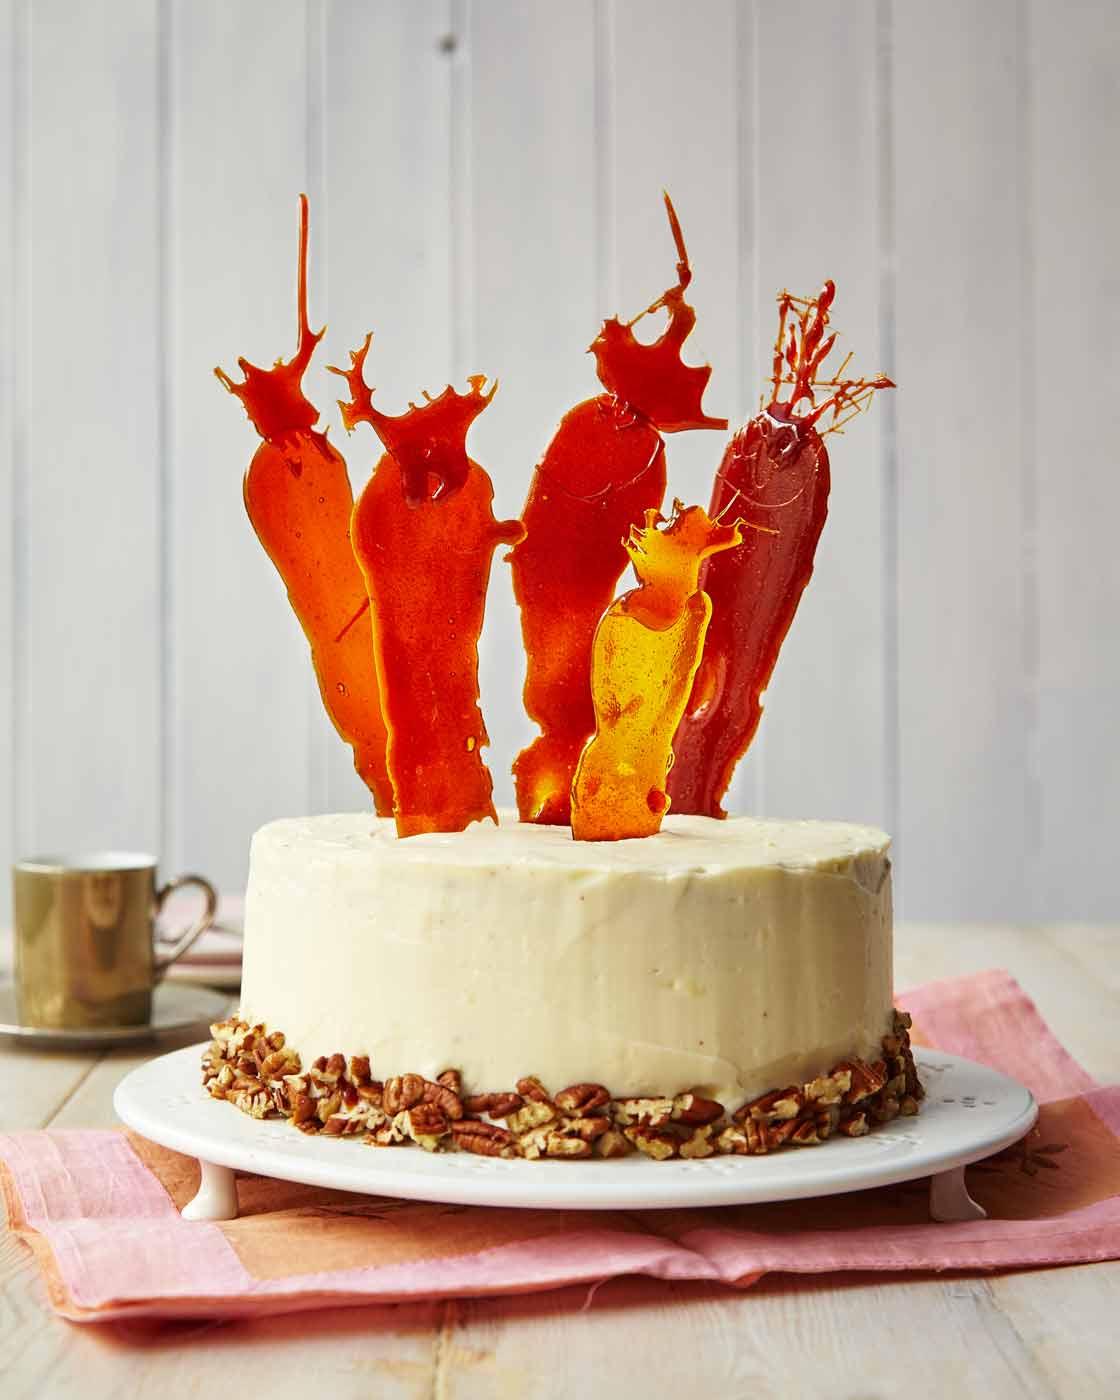 100+ [ Sainsburys Childrens Birthday Cakes ] The 25 Best ...